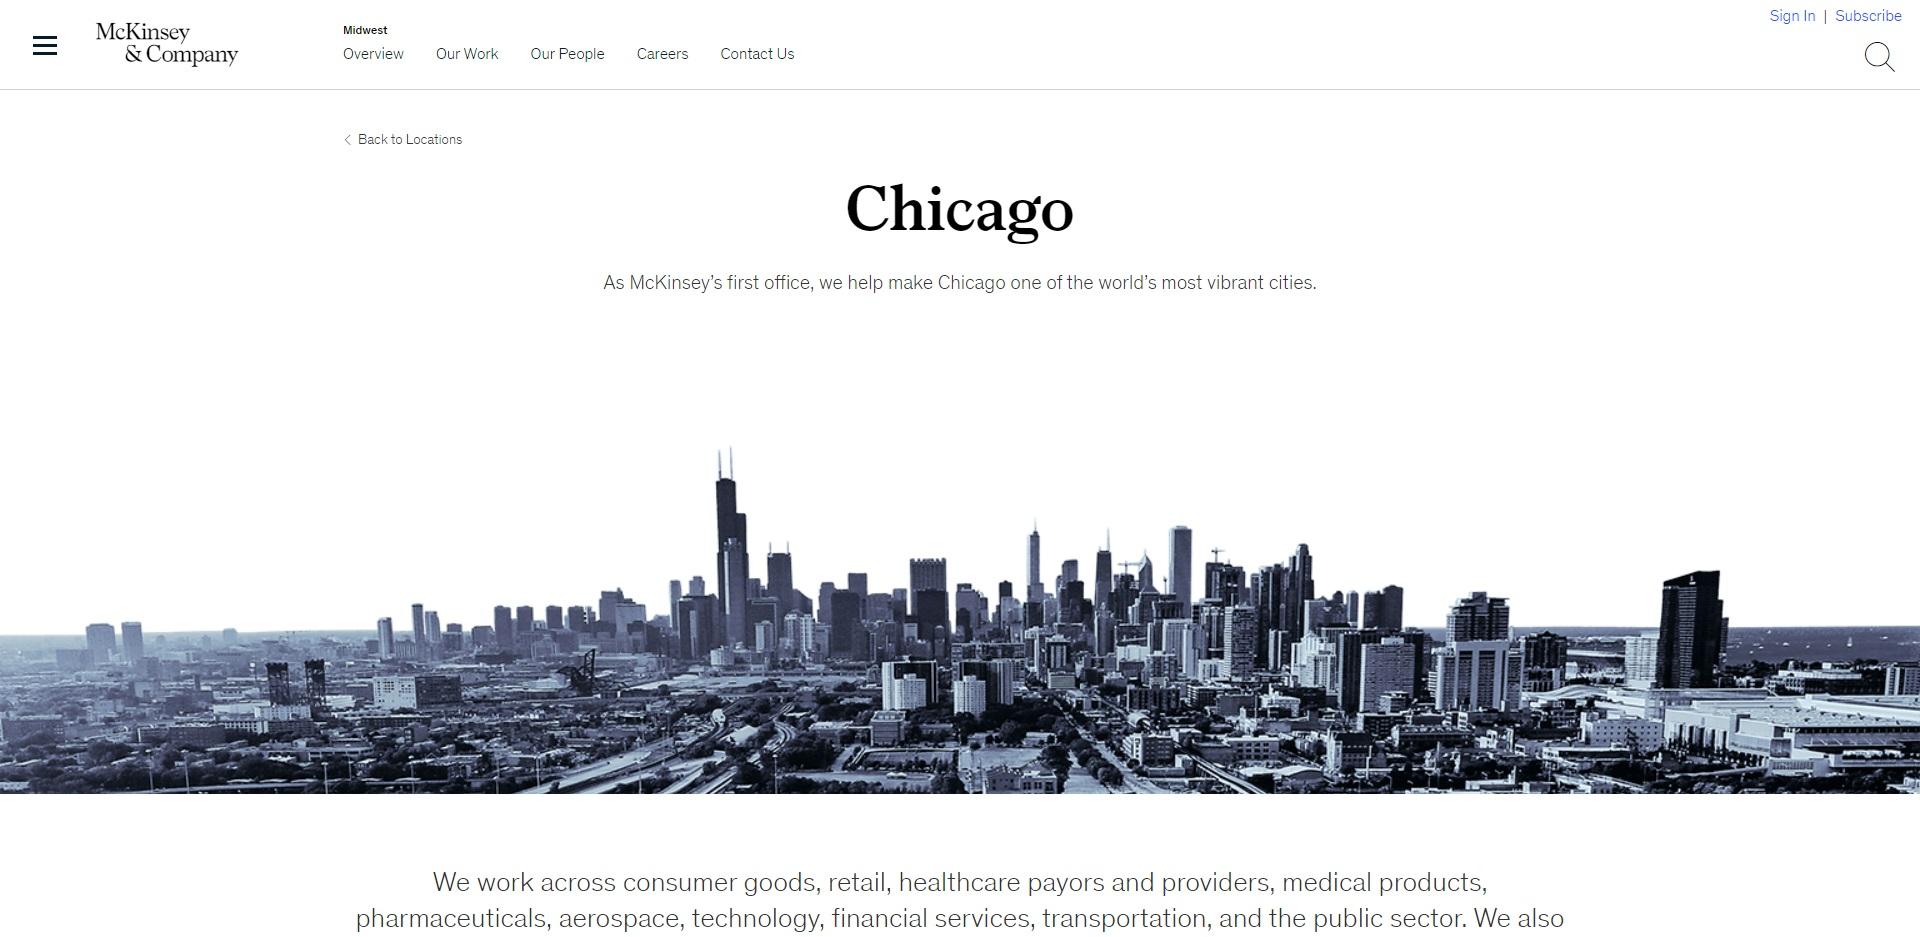 Best Business Management in Chicago